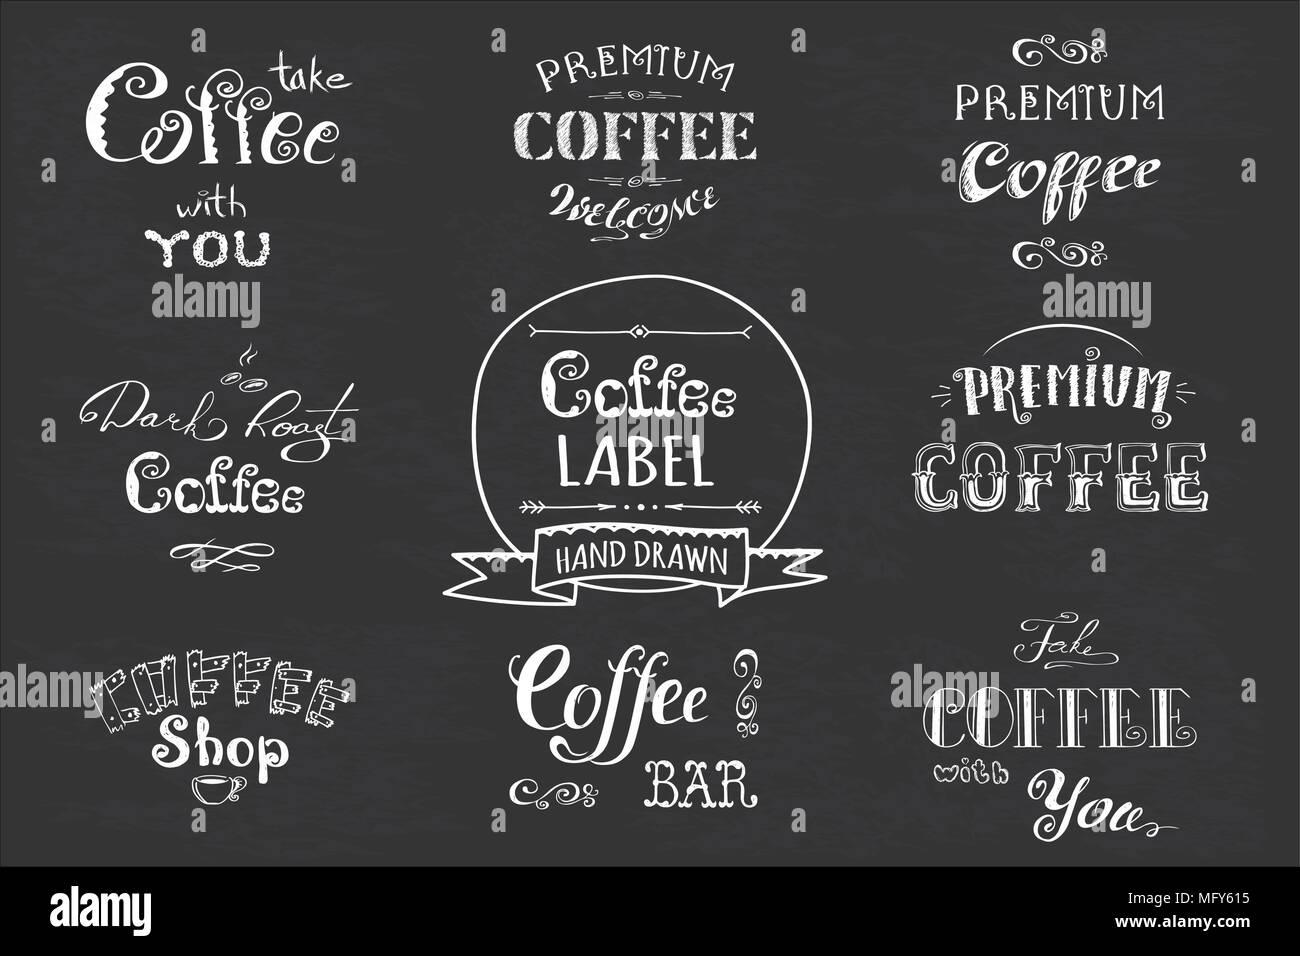 Set Coffee Labelbanner Or Typographylettering Hand Drawn Chalkboard Dark Background Stock Vector Illustration